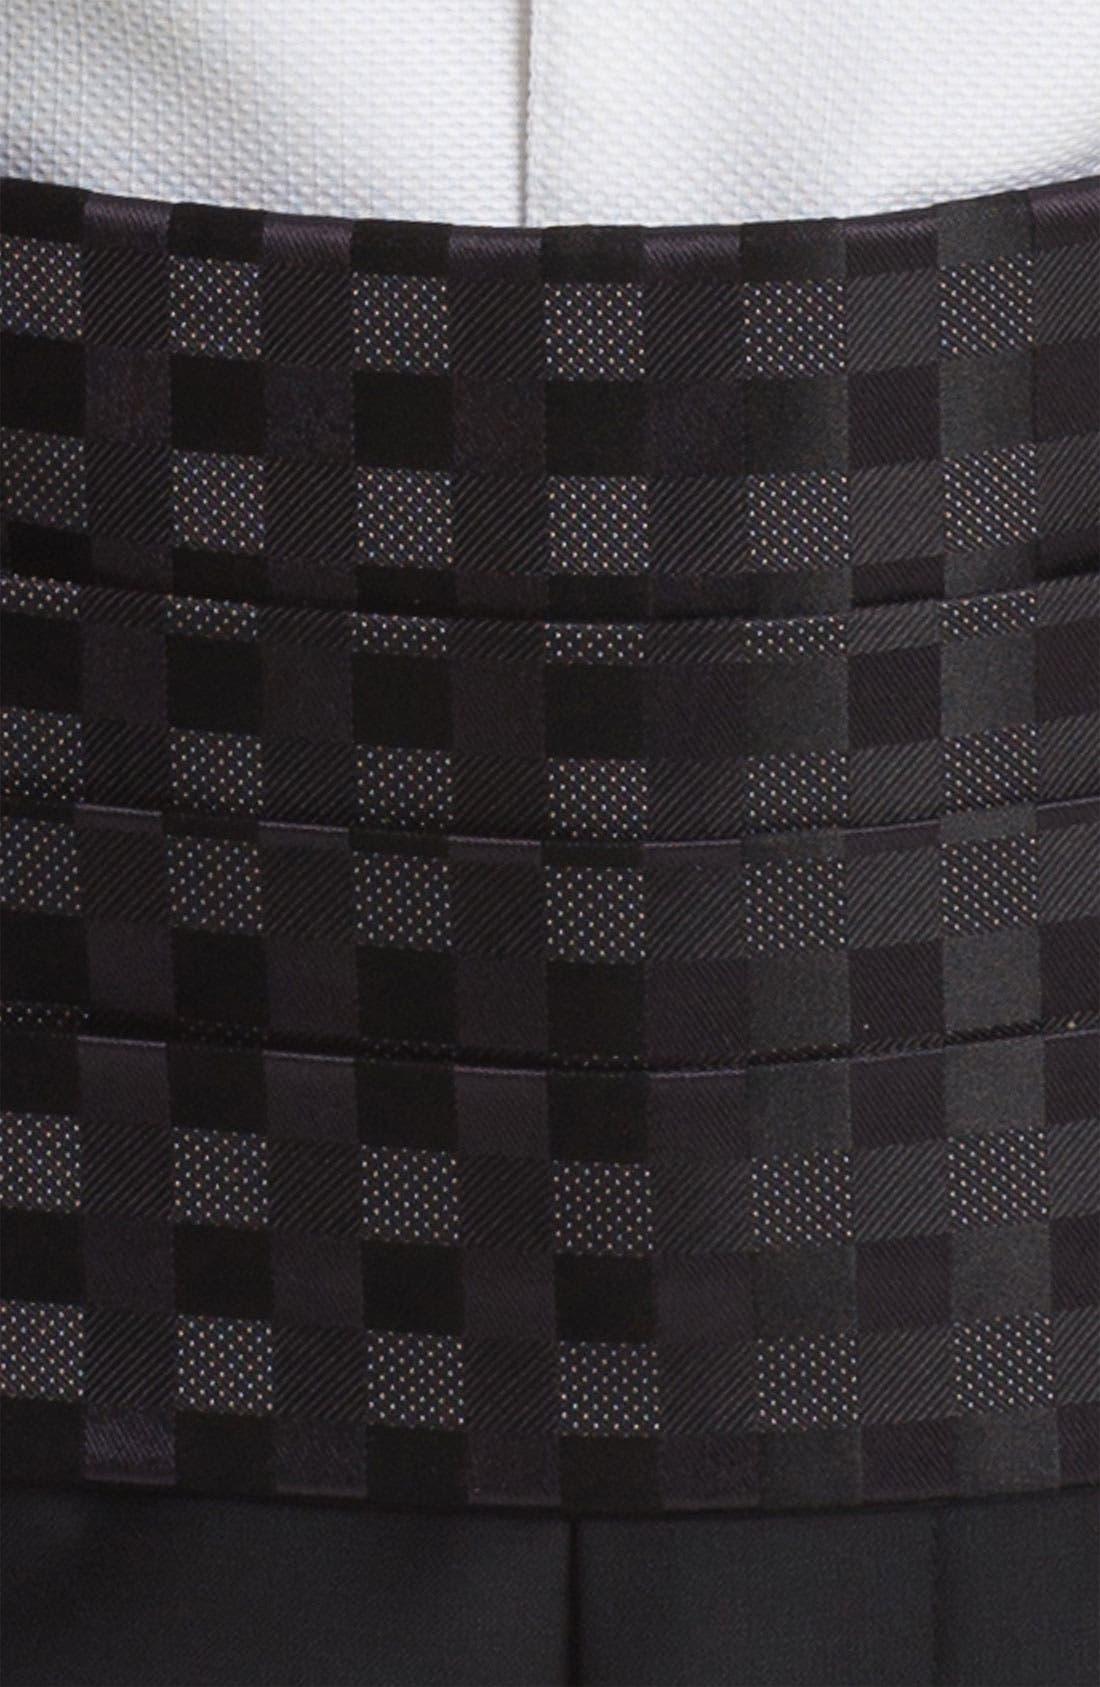 Alternate Image 2  - David Donahue Cummerbund & Bow Tie